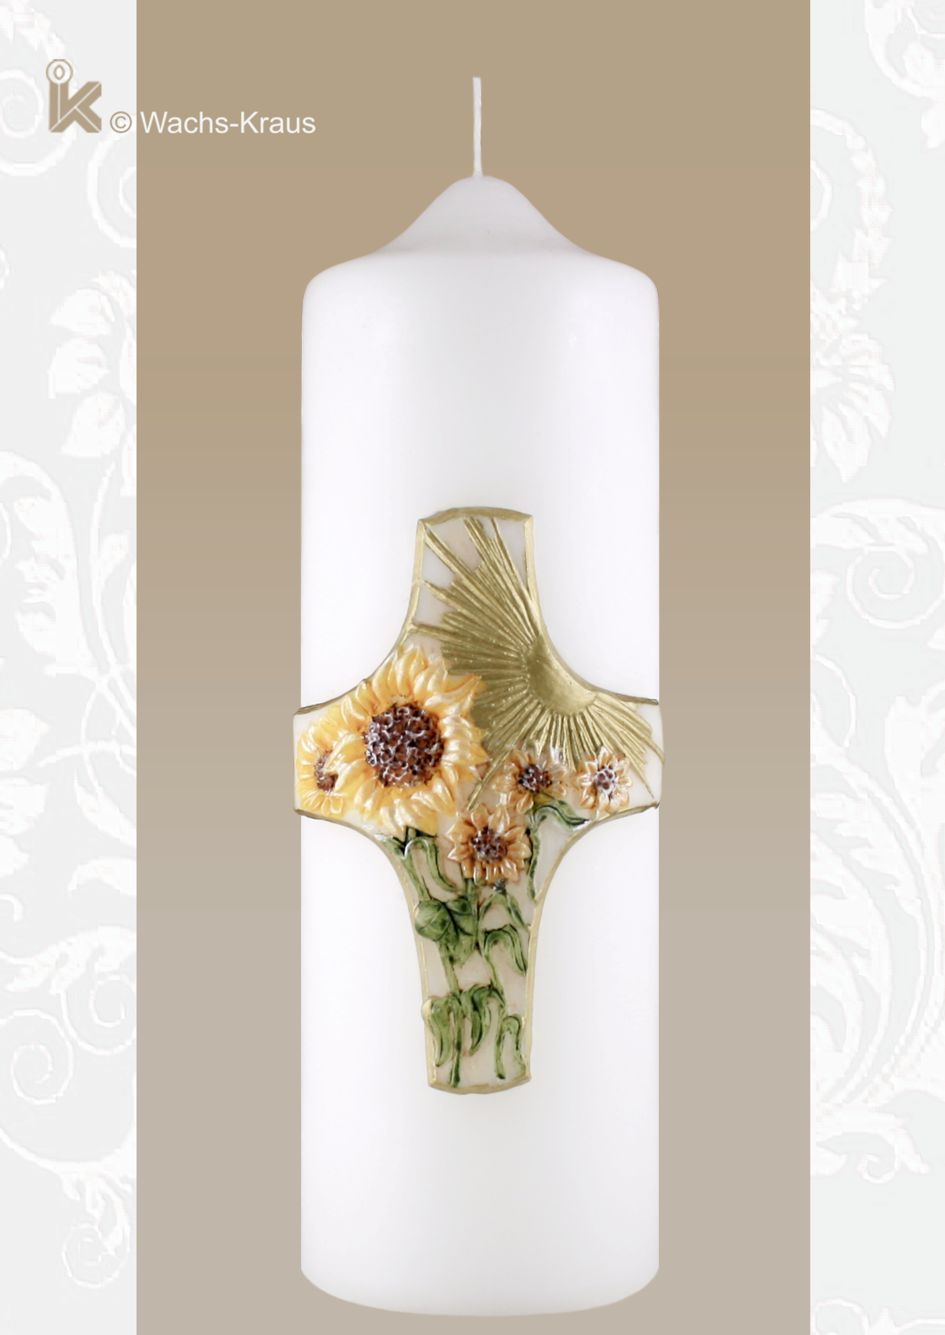 Kerze zum Geburtstag Sonnenblume, Kreuz